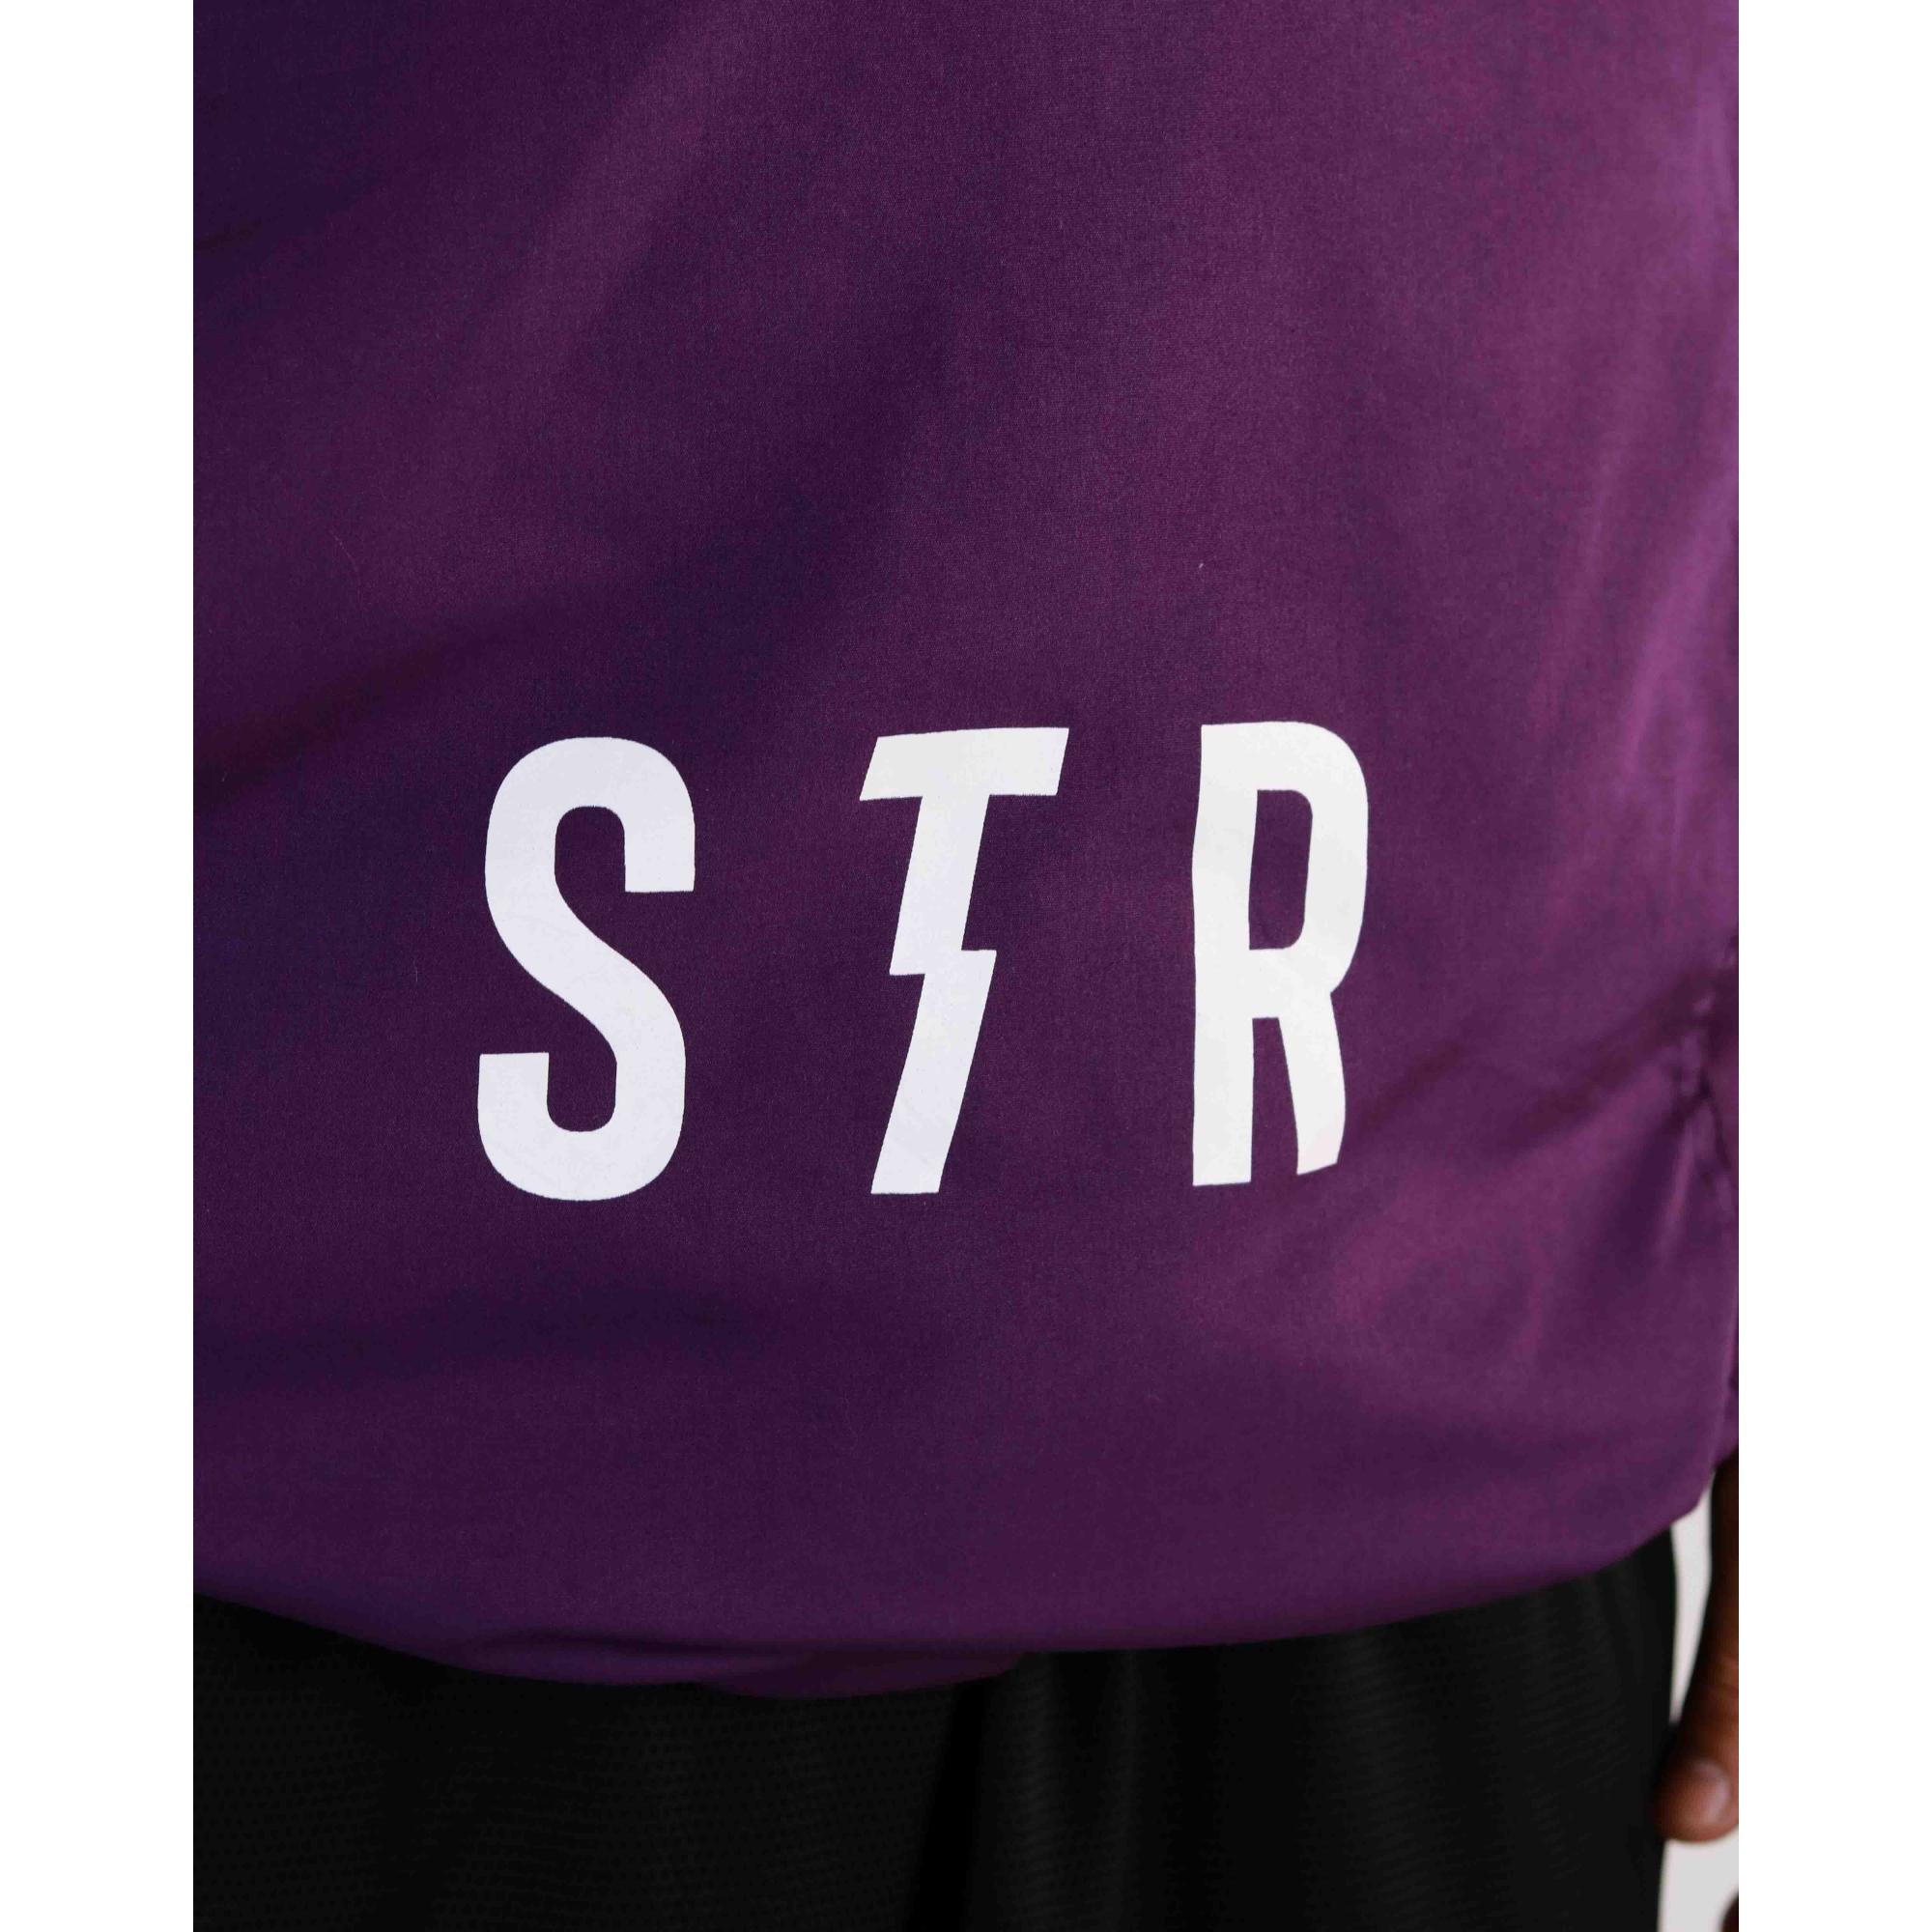 CORTA VENTO STRANGER INV2021 - LAR/ROX